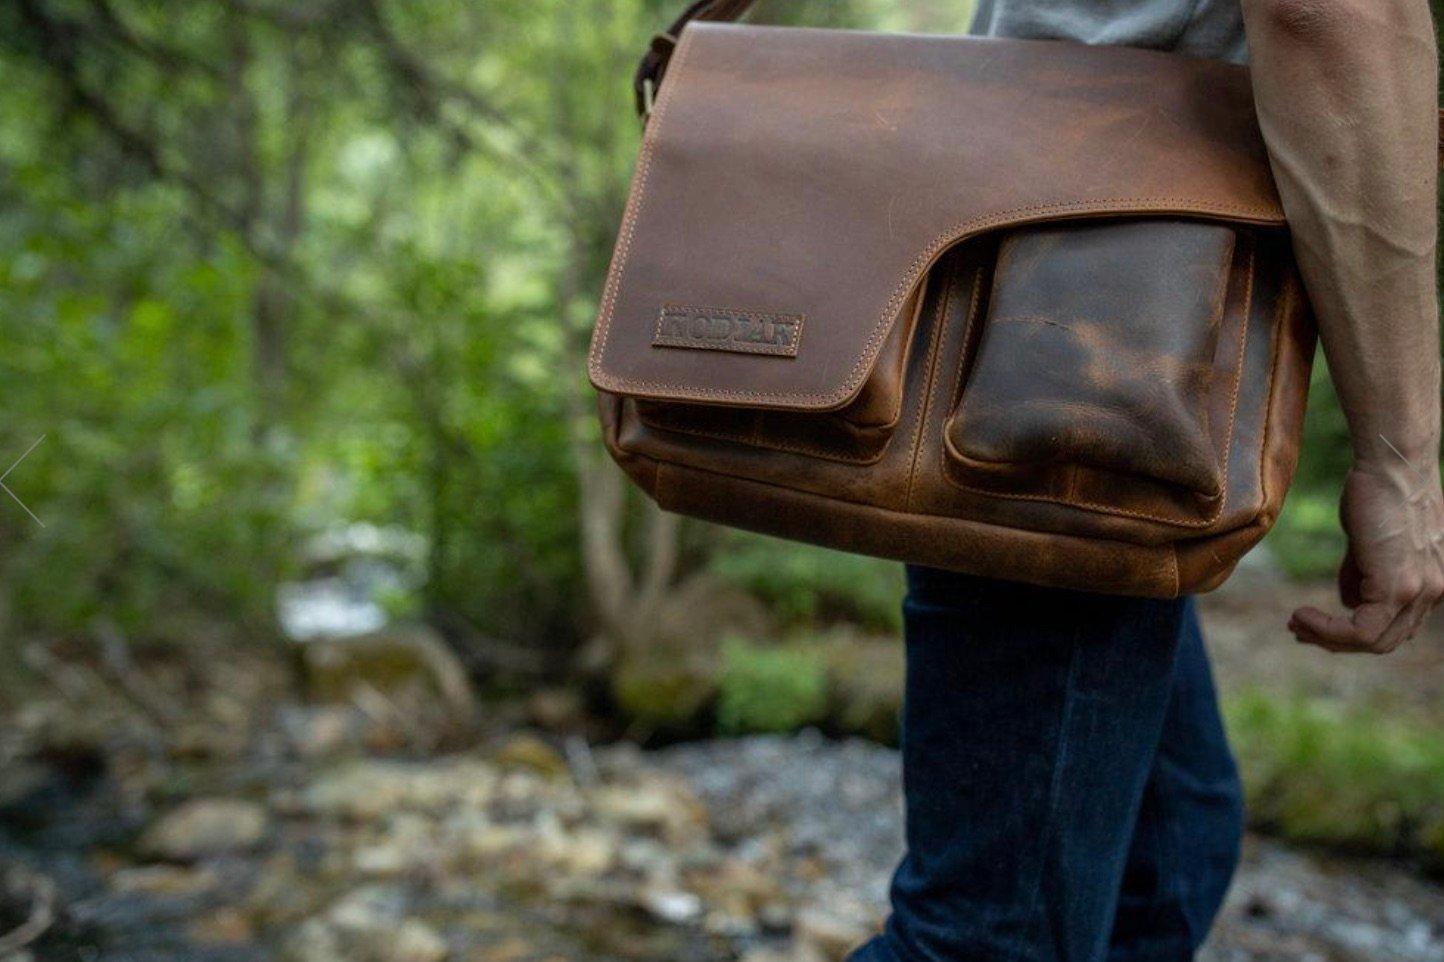 kodiak leather messenger bag review